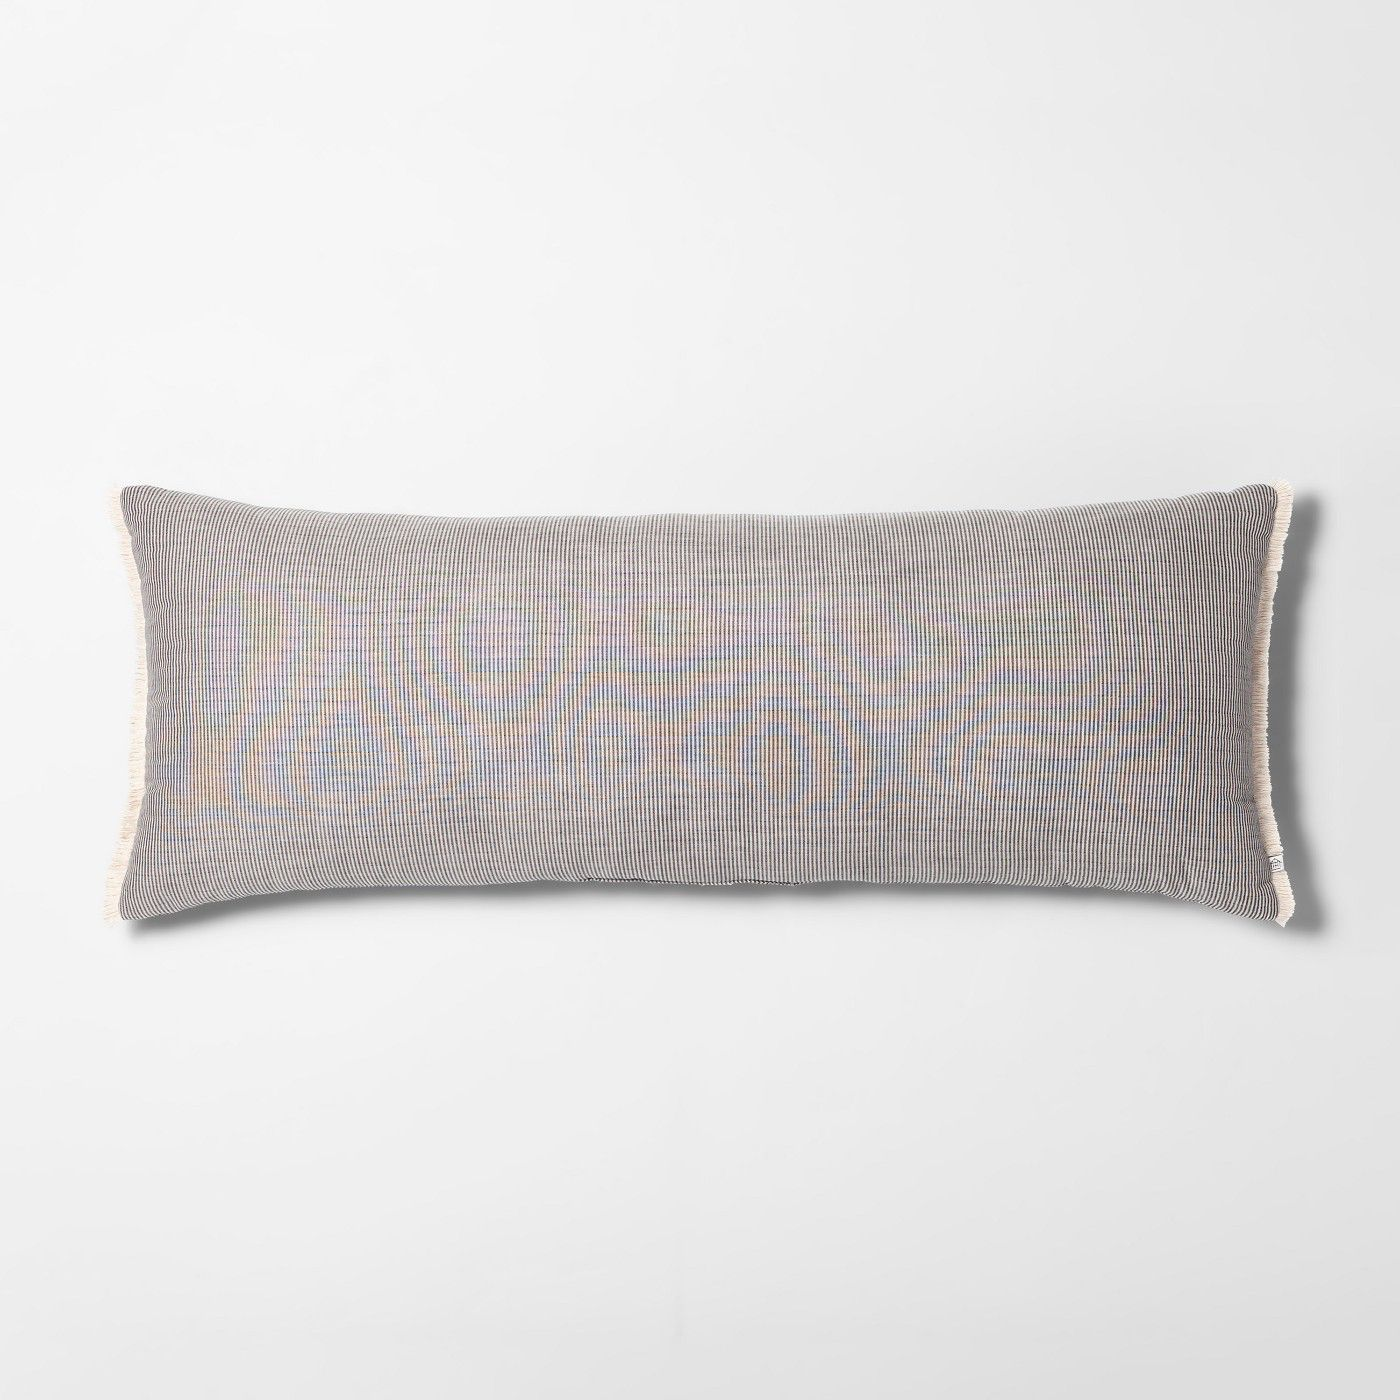 Lumbar Throw Pillow Striped Double Weave Hearth Amp Hand With Magnolia Lumbar Throw Pillow